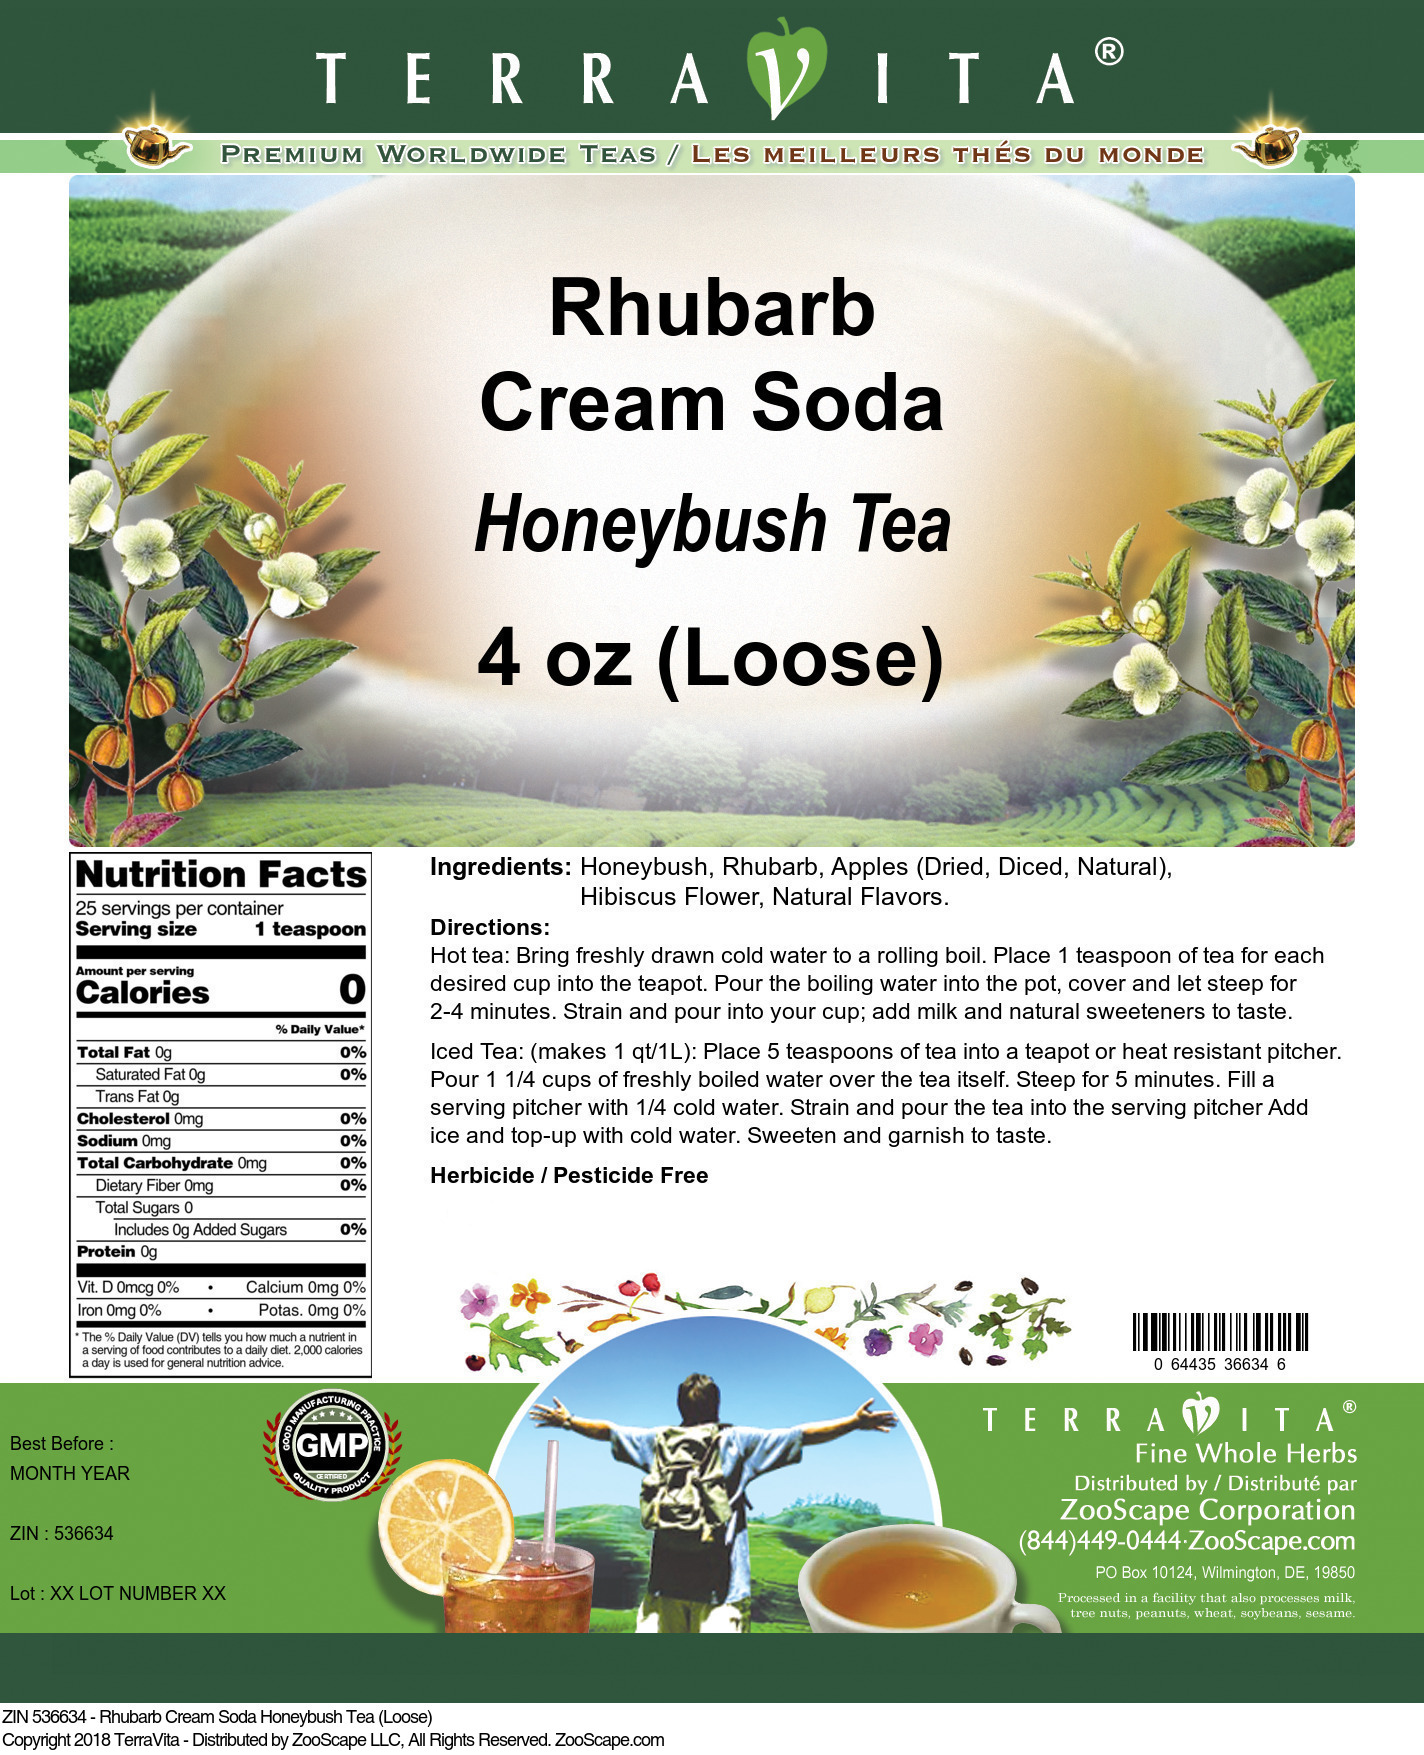 Rhubarb Cream Soda Honeybush Tea